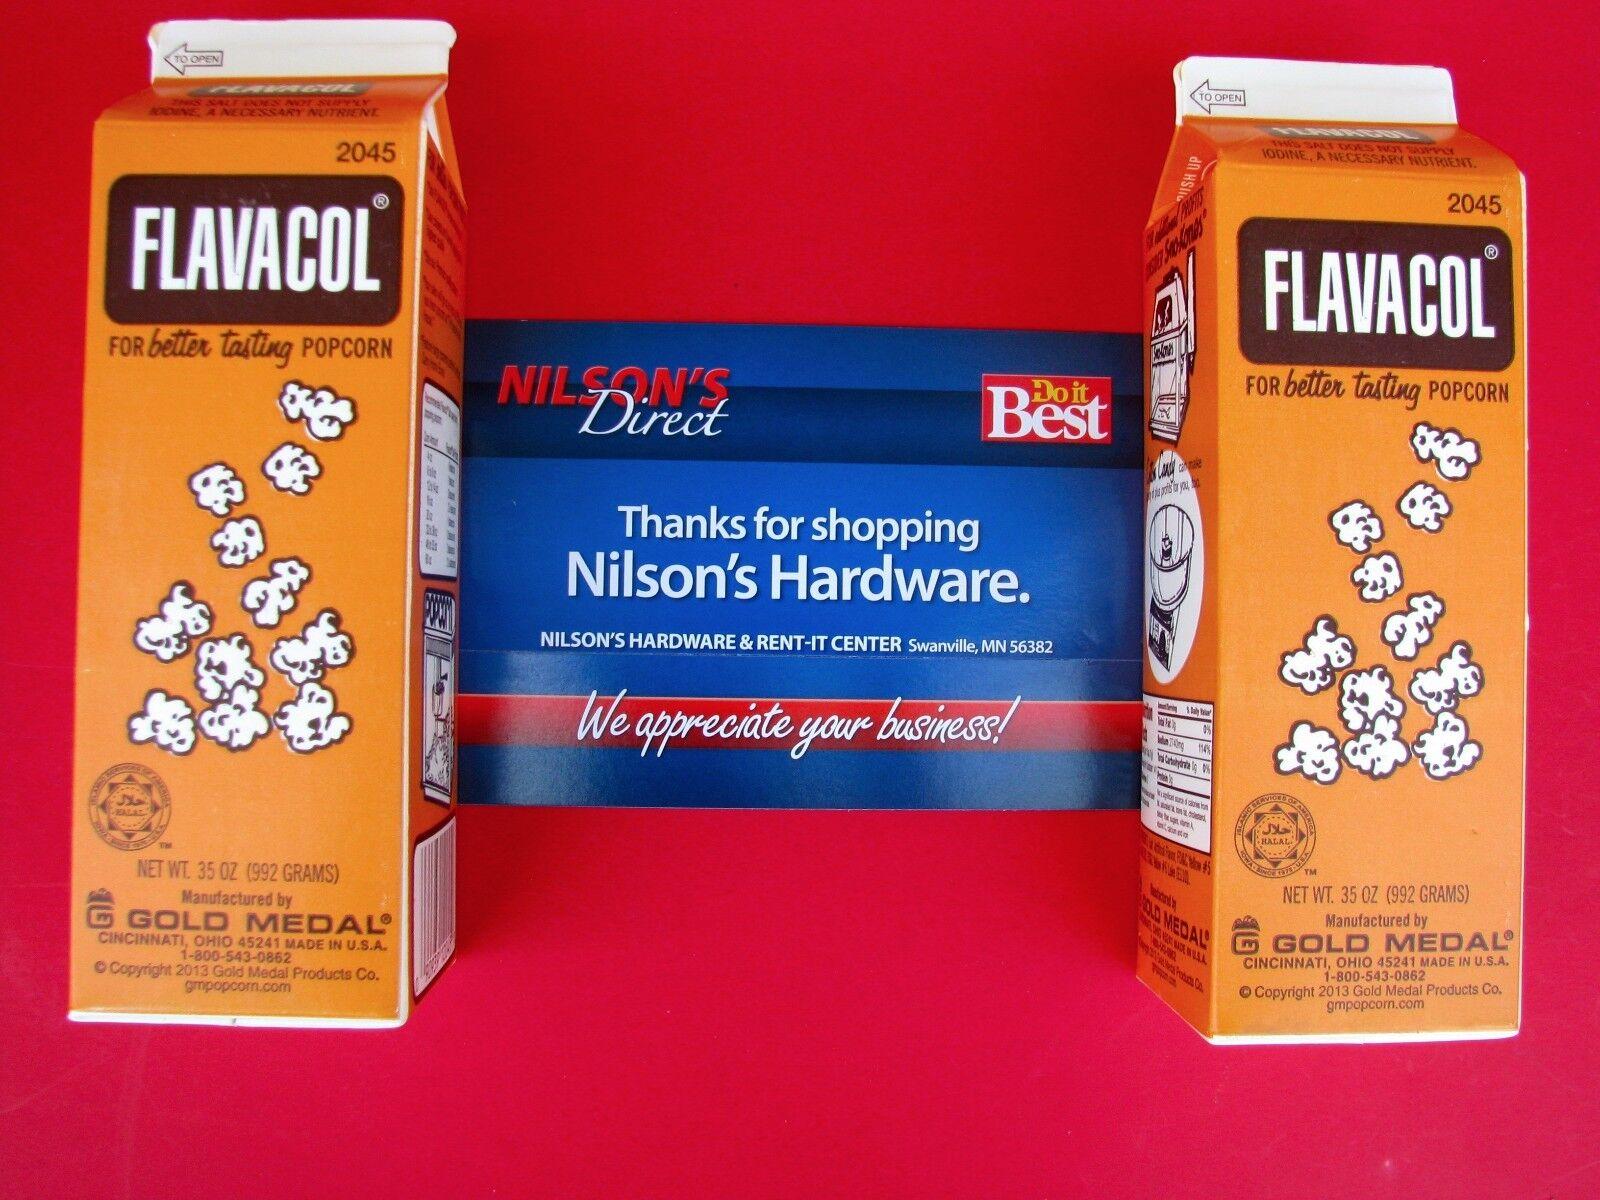 2pk Flavacol Seasoning Popcorn Pop Corn Salt Ingredient Yellow Color Apeal 2045